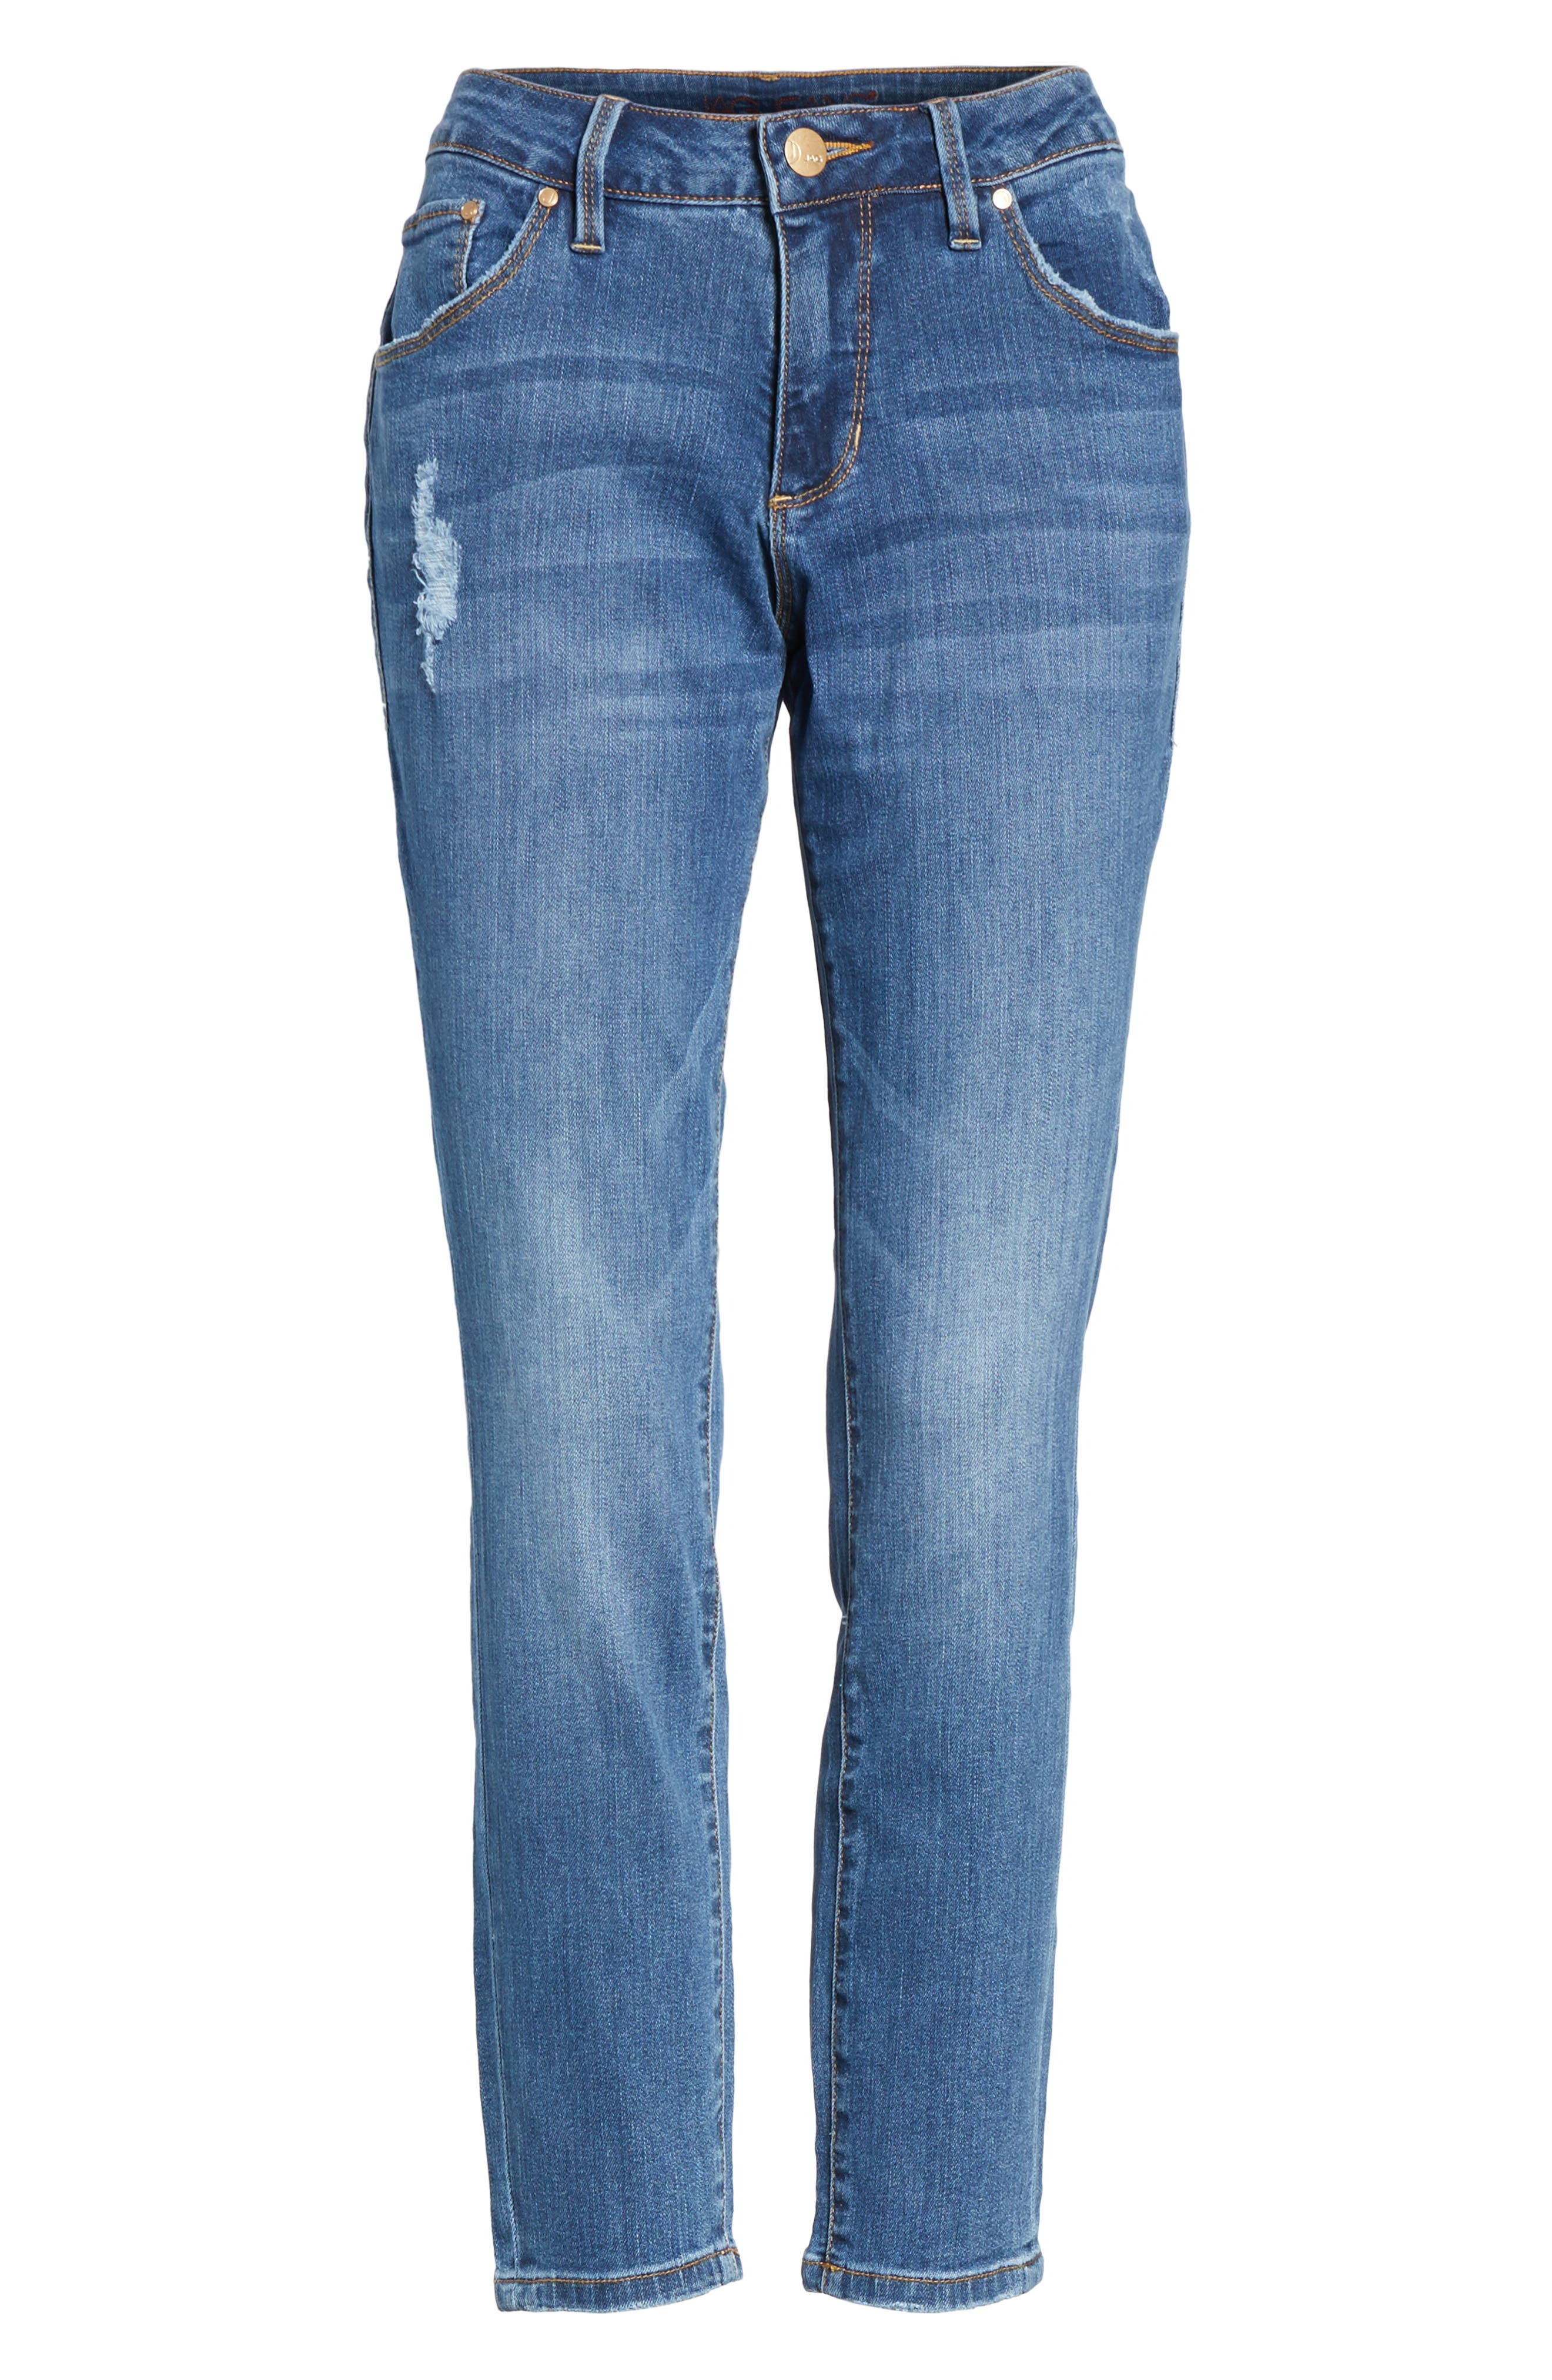 Mera Skinny Ankle Jeans,                             Alternate thumbnail 6, color,                             420